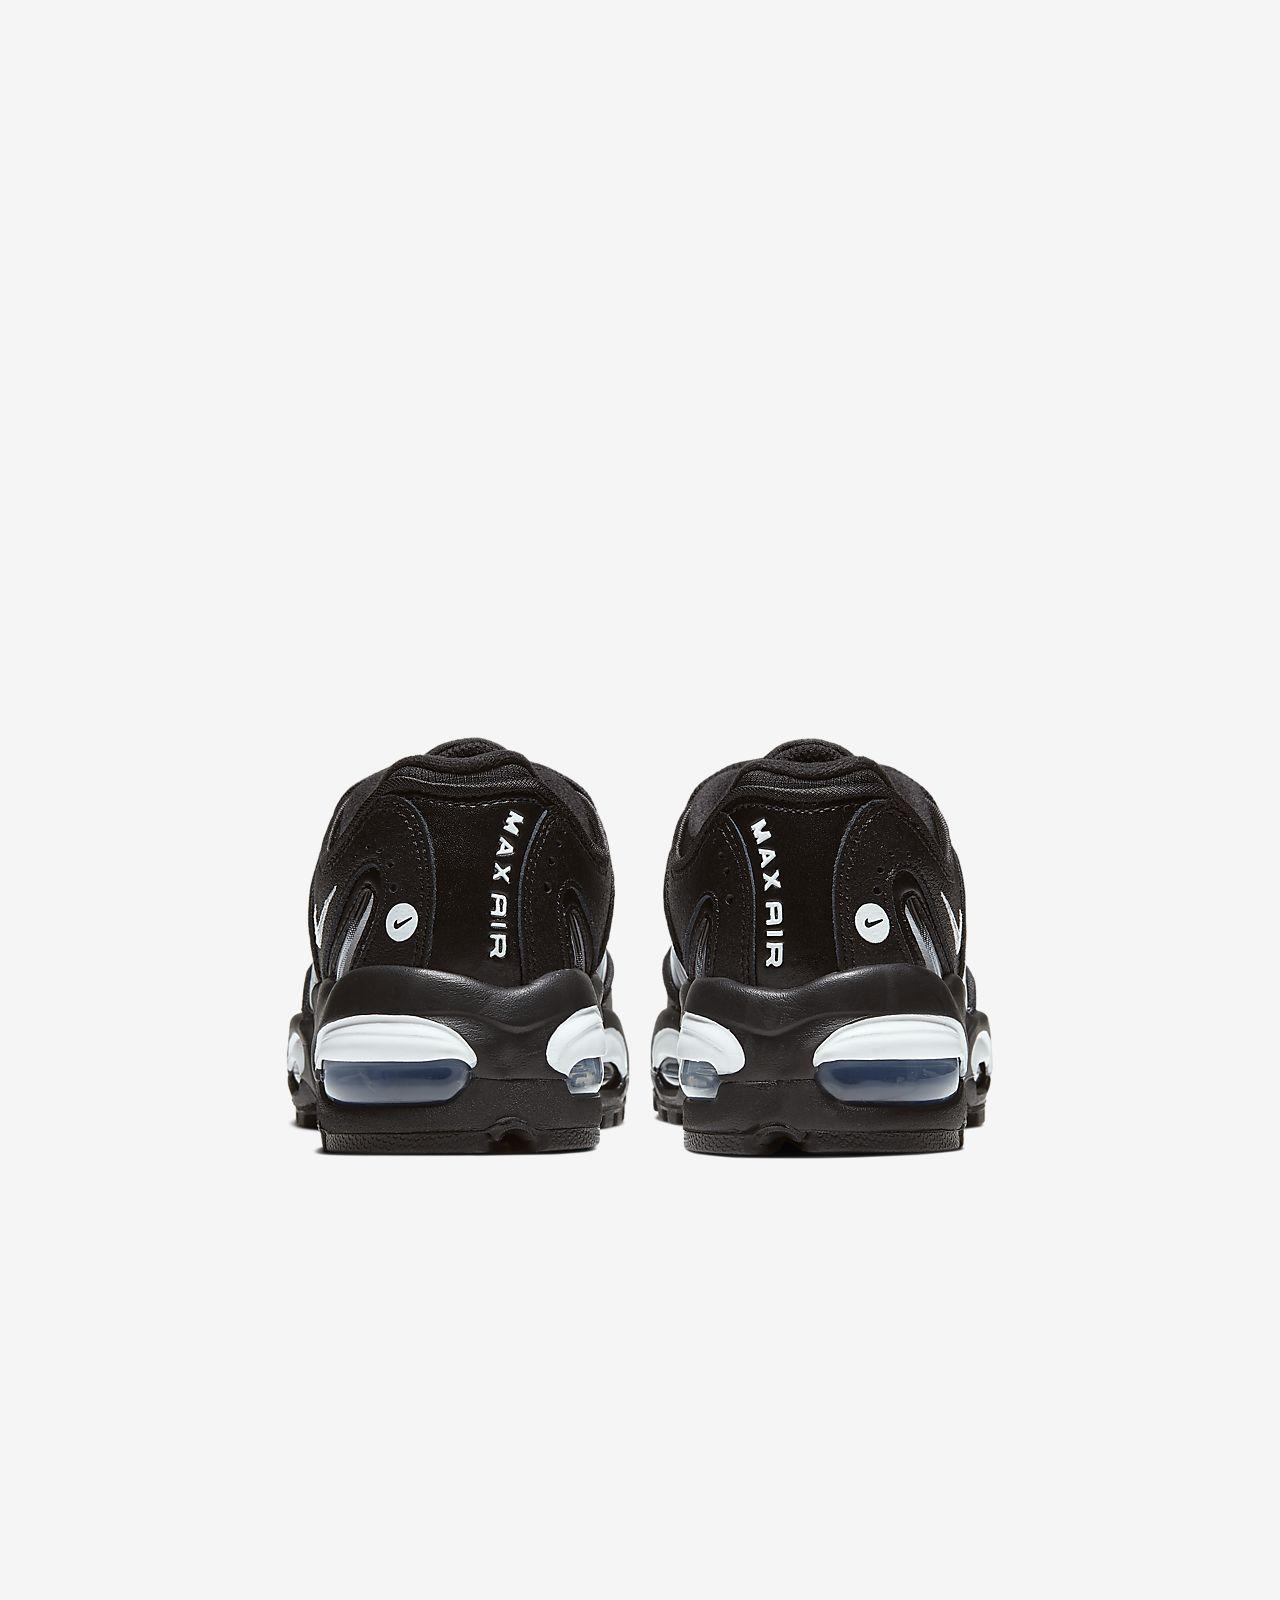 Nike Air Tailwind IV SP sko til store barn